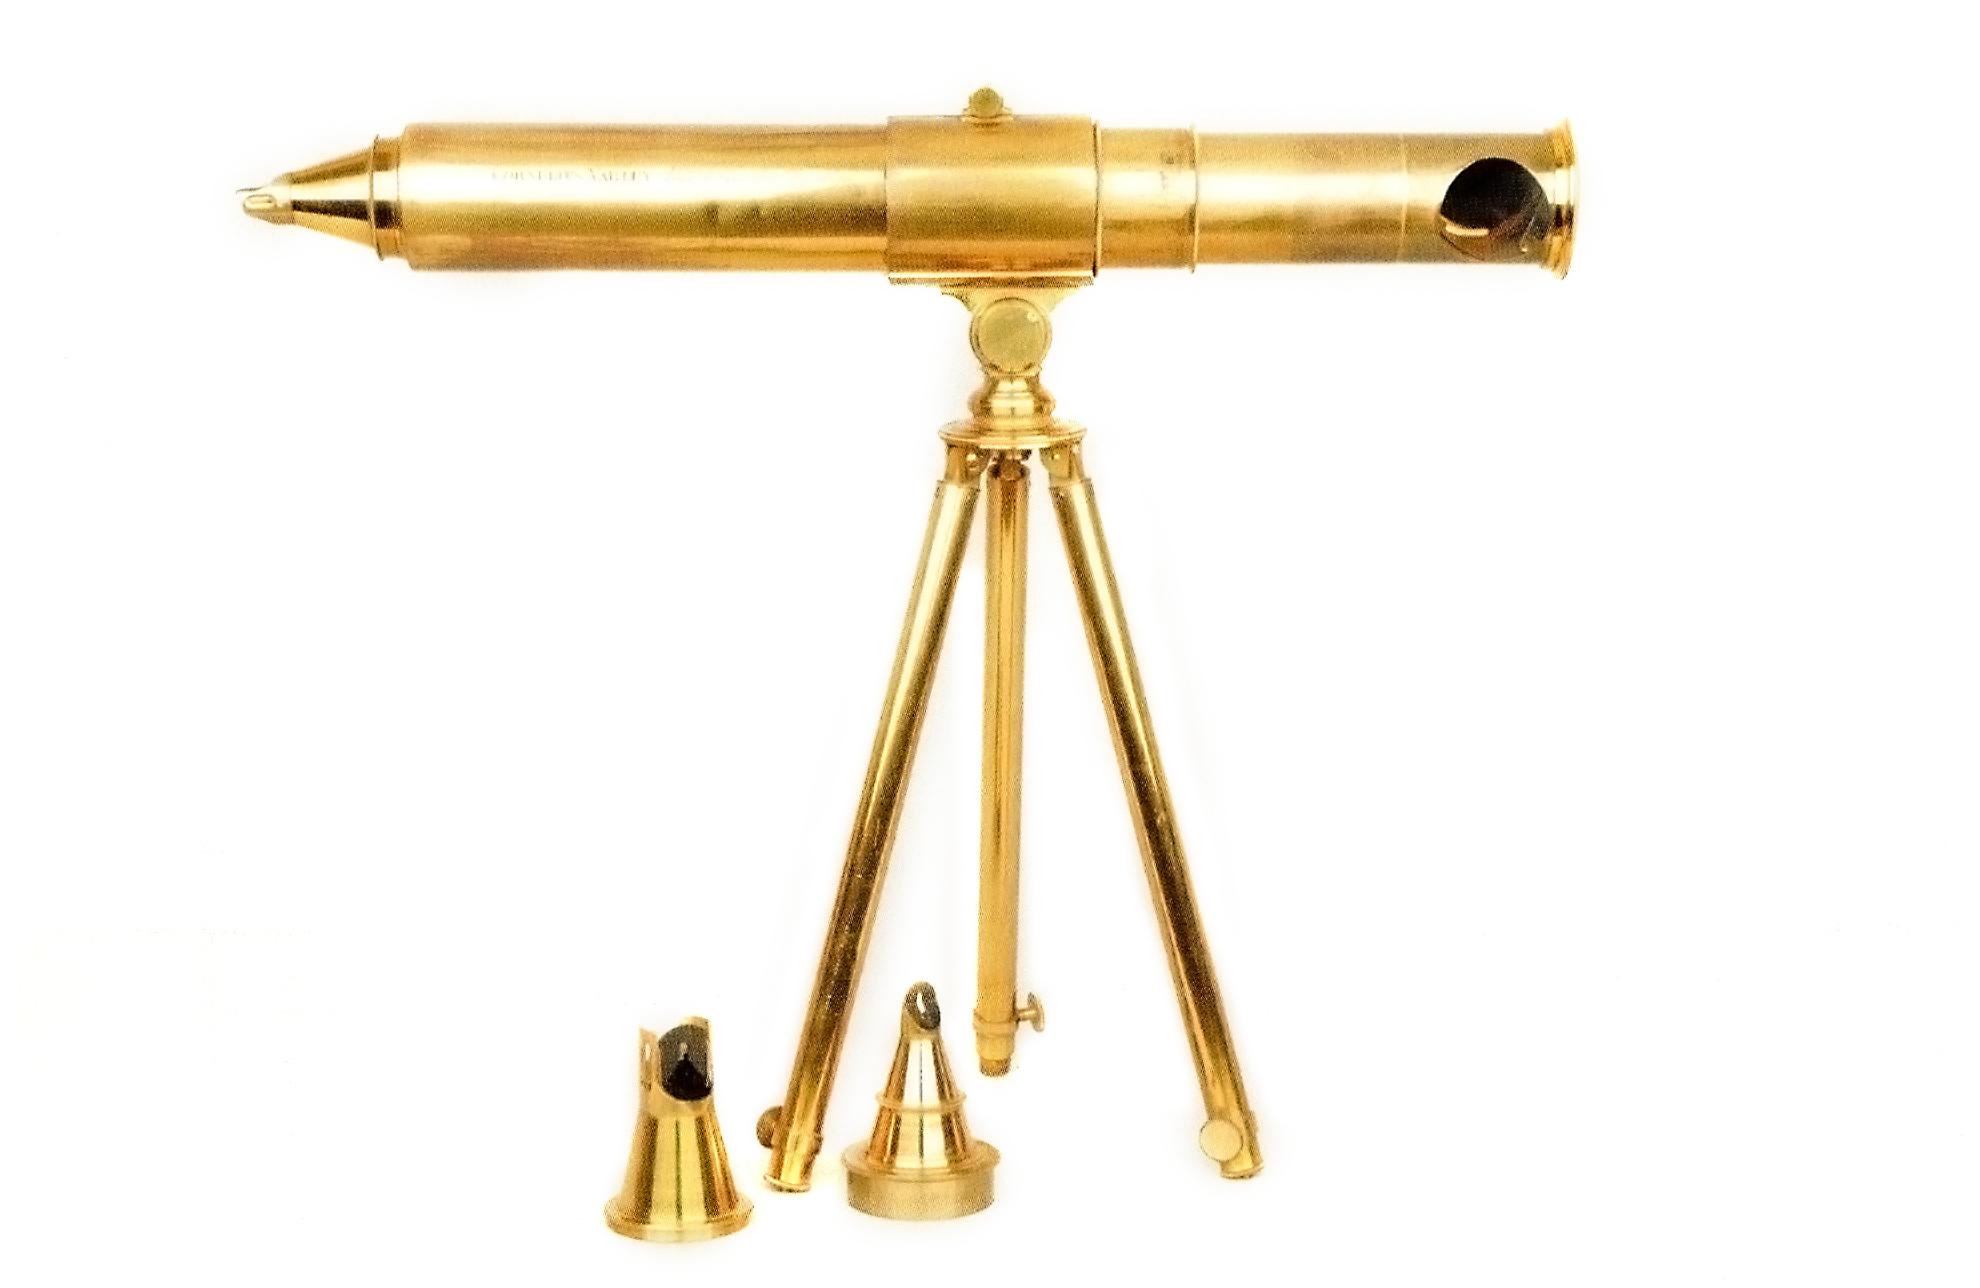 Cornelius Varley's Patent Graphic Telescope with interchangeable accessories. (Whipple Collections, Cambridge University)